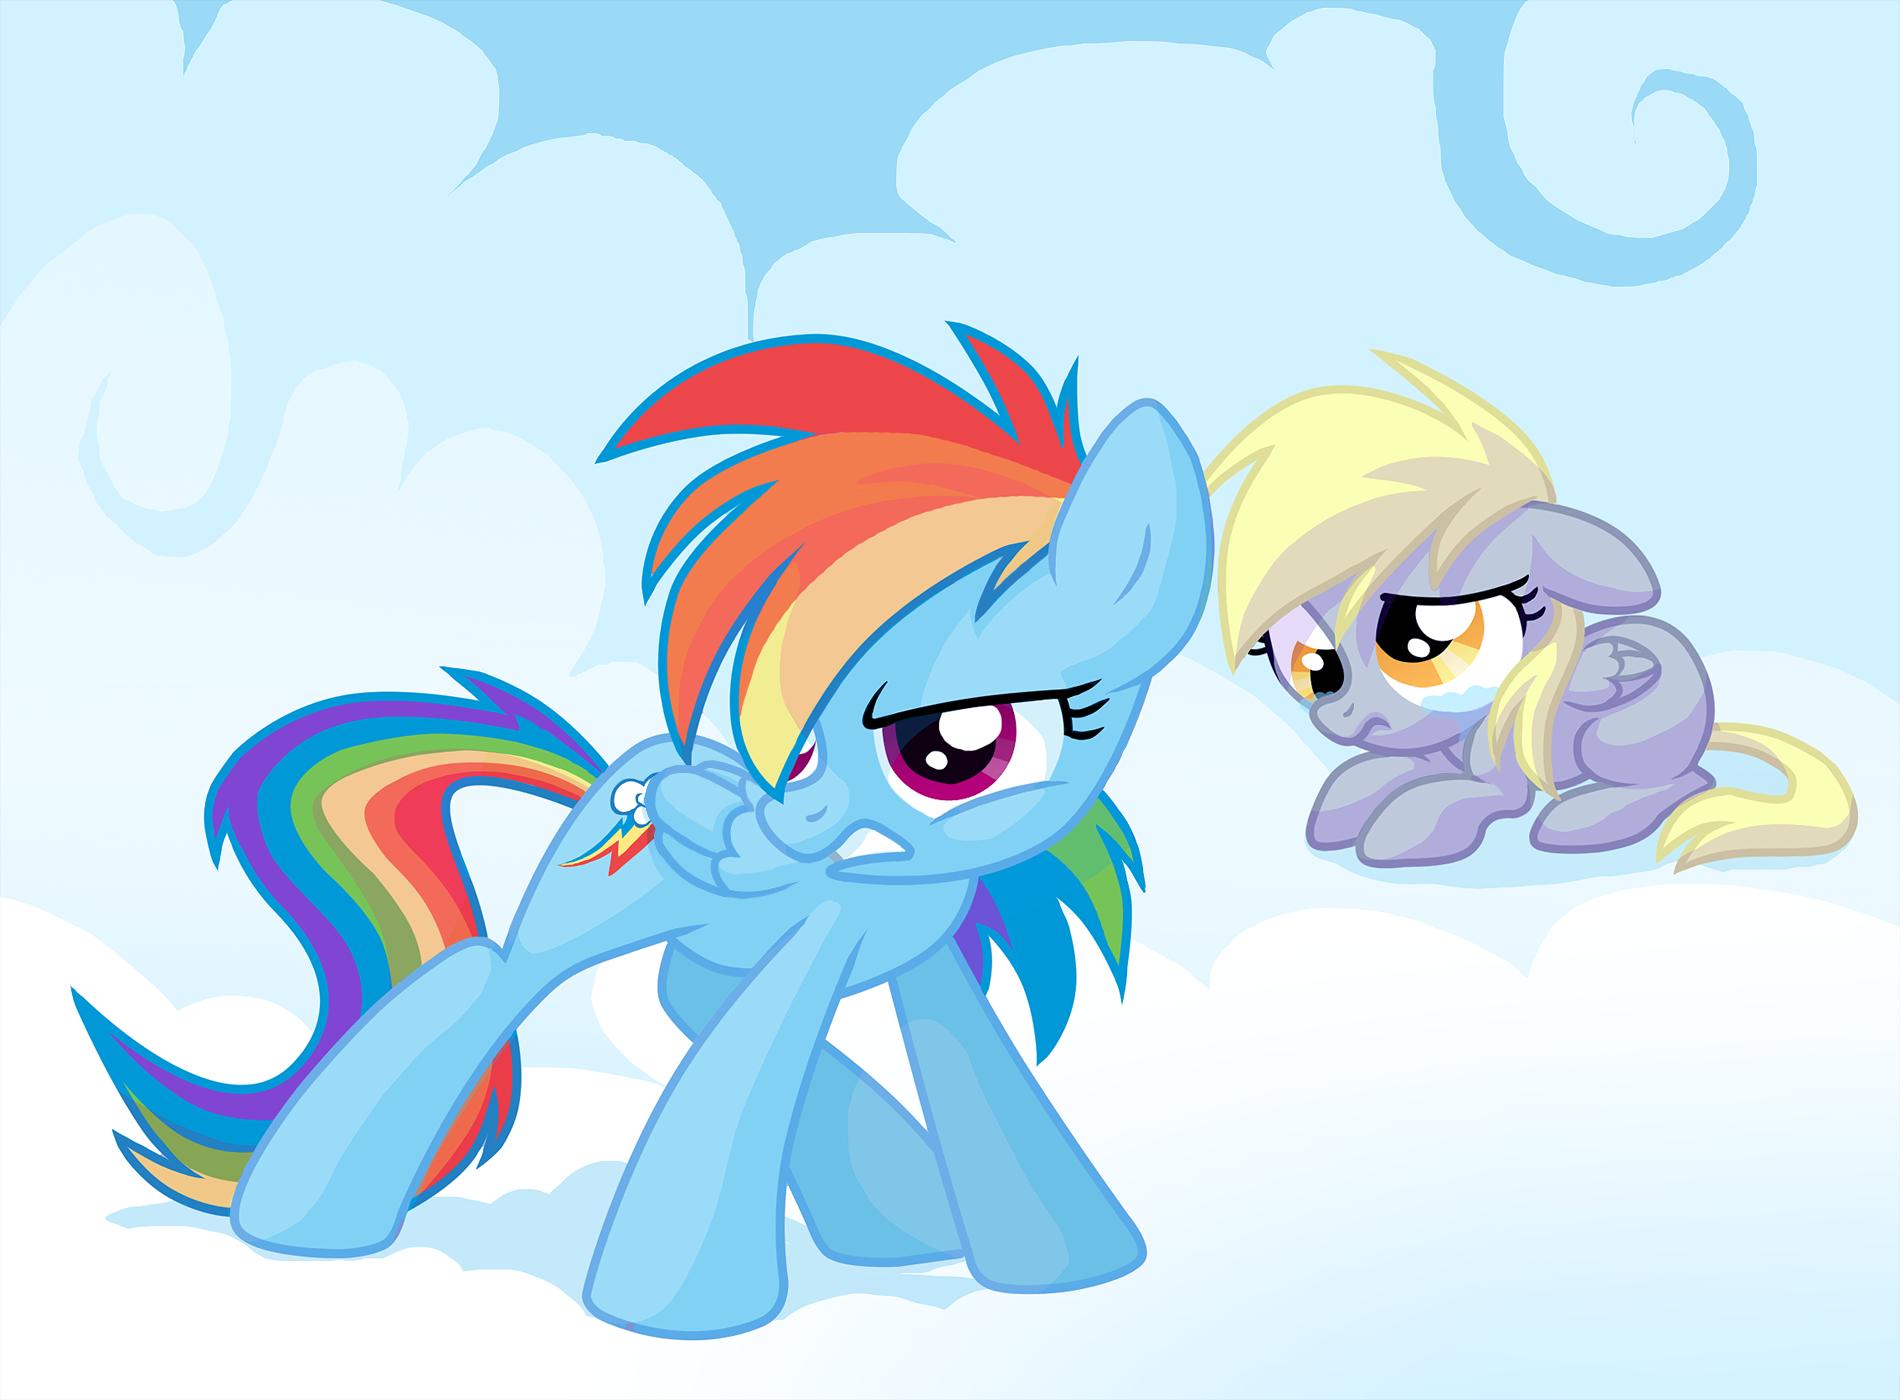 derpy hooves and rainbow dash drawn by feyrah - Bronibooru  Filly Rainbow Dash And Derpy